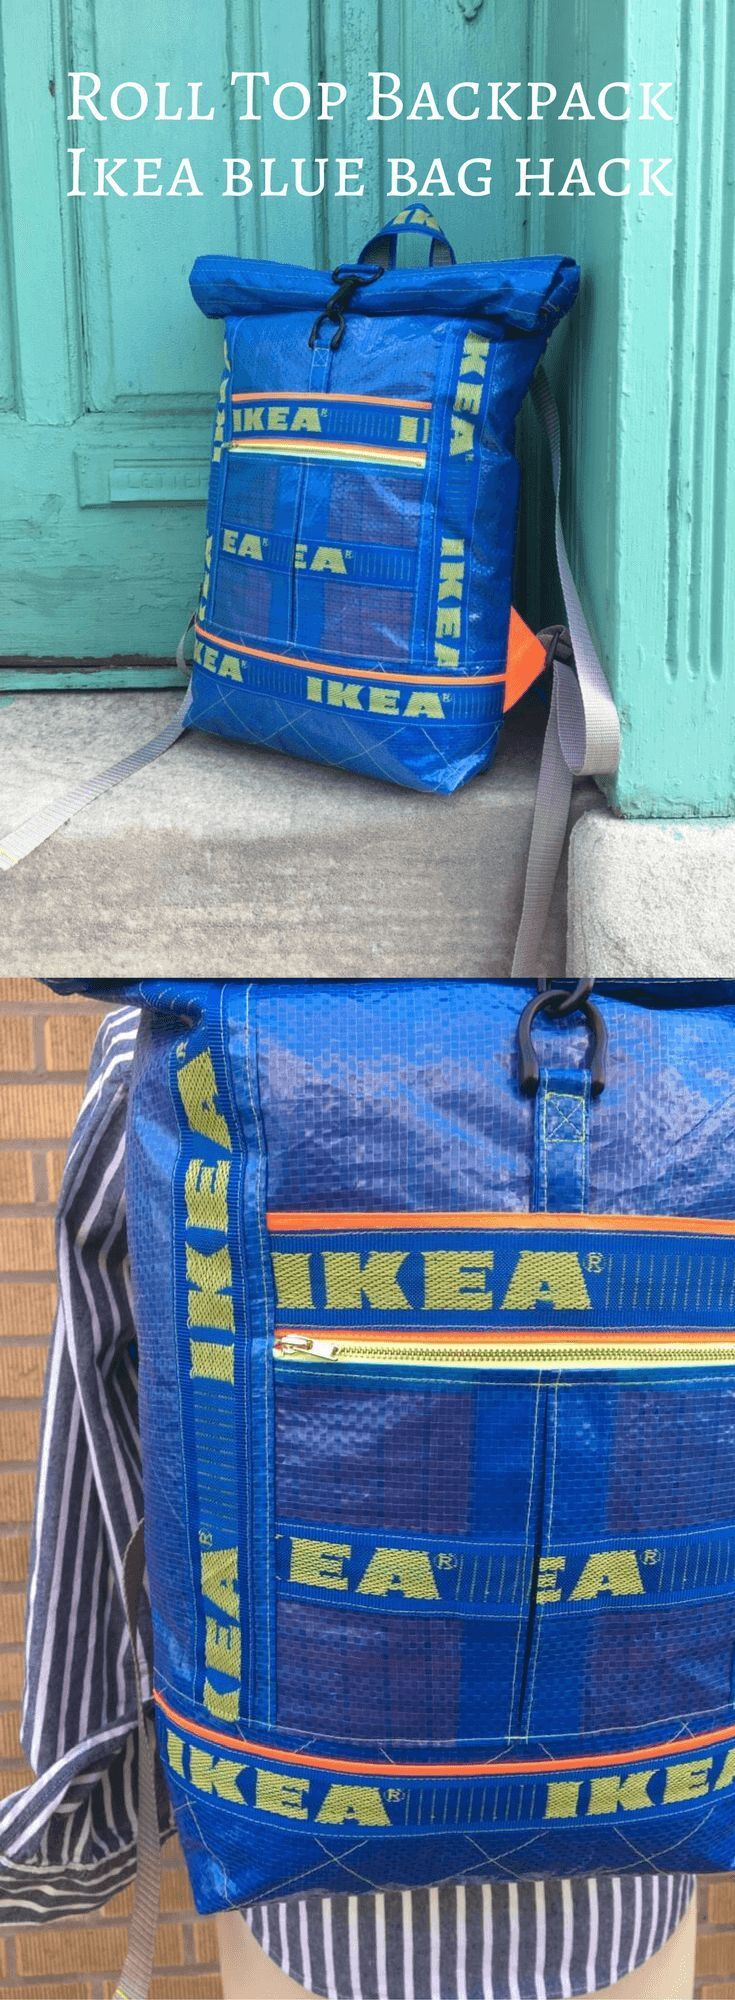 Gut nähen! Ein Roll-Top-Rucksack von IKEA Blue Bags www.ikeahackers.n … - UPCYCLING IDEEN #ikeaideen